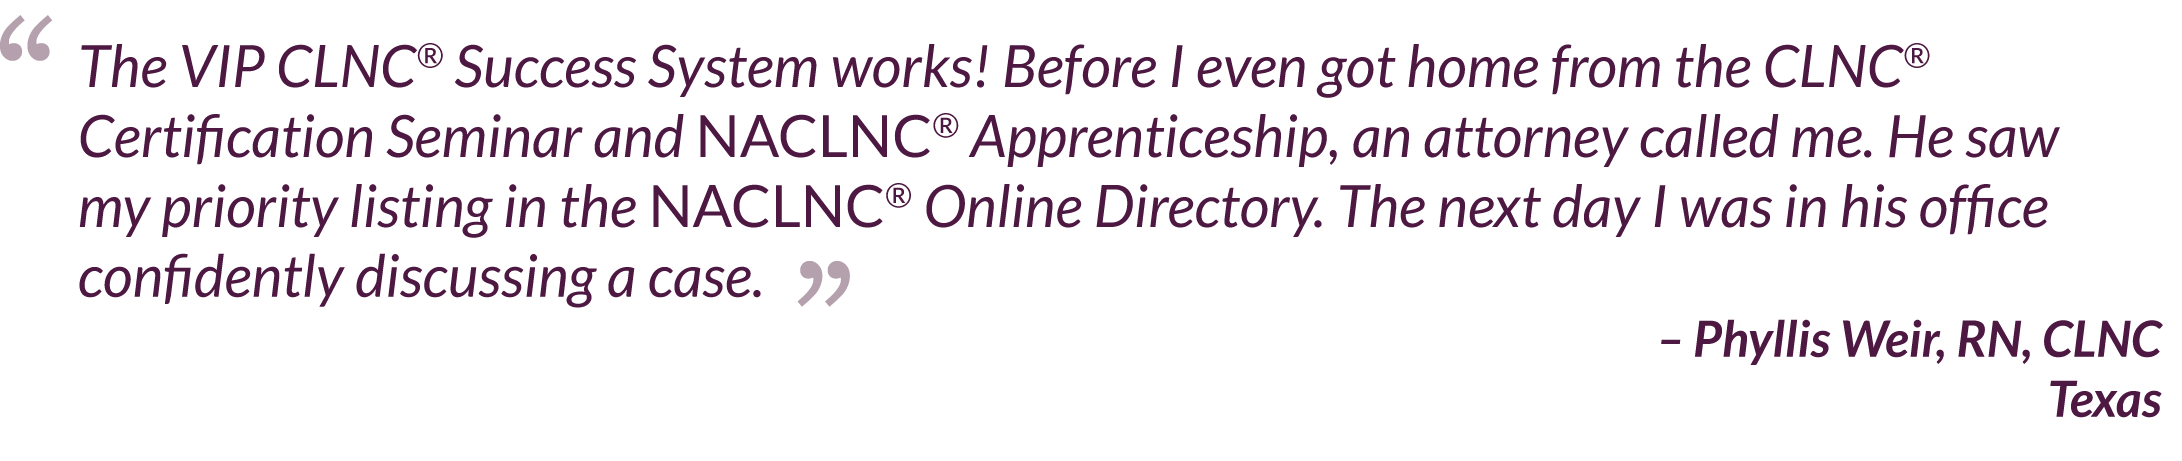 VIP CLNC® Success System Testimonial